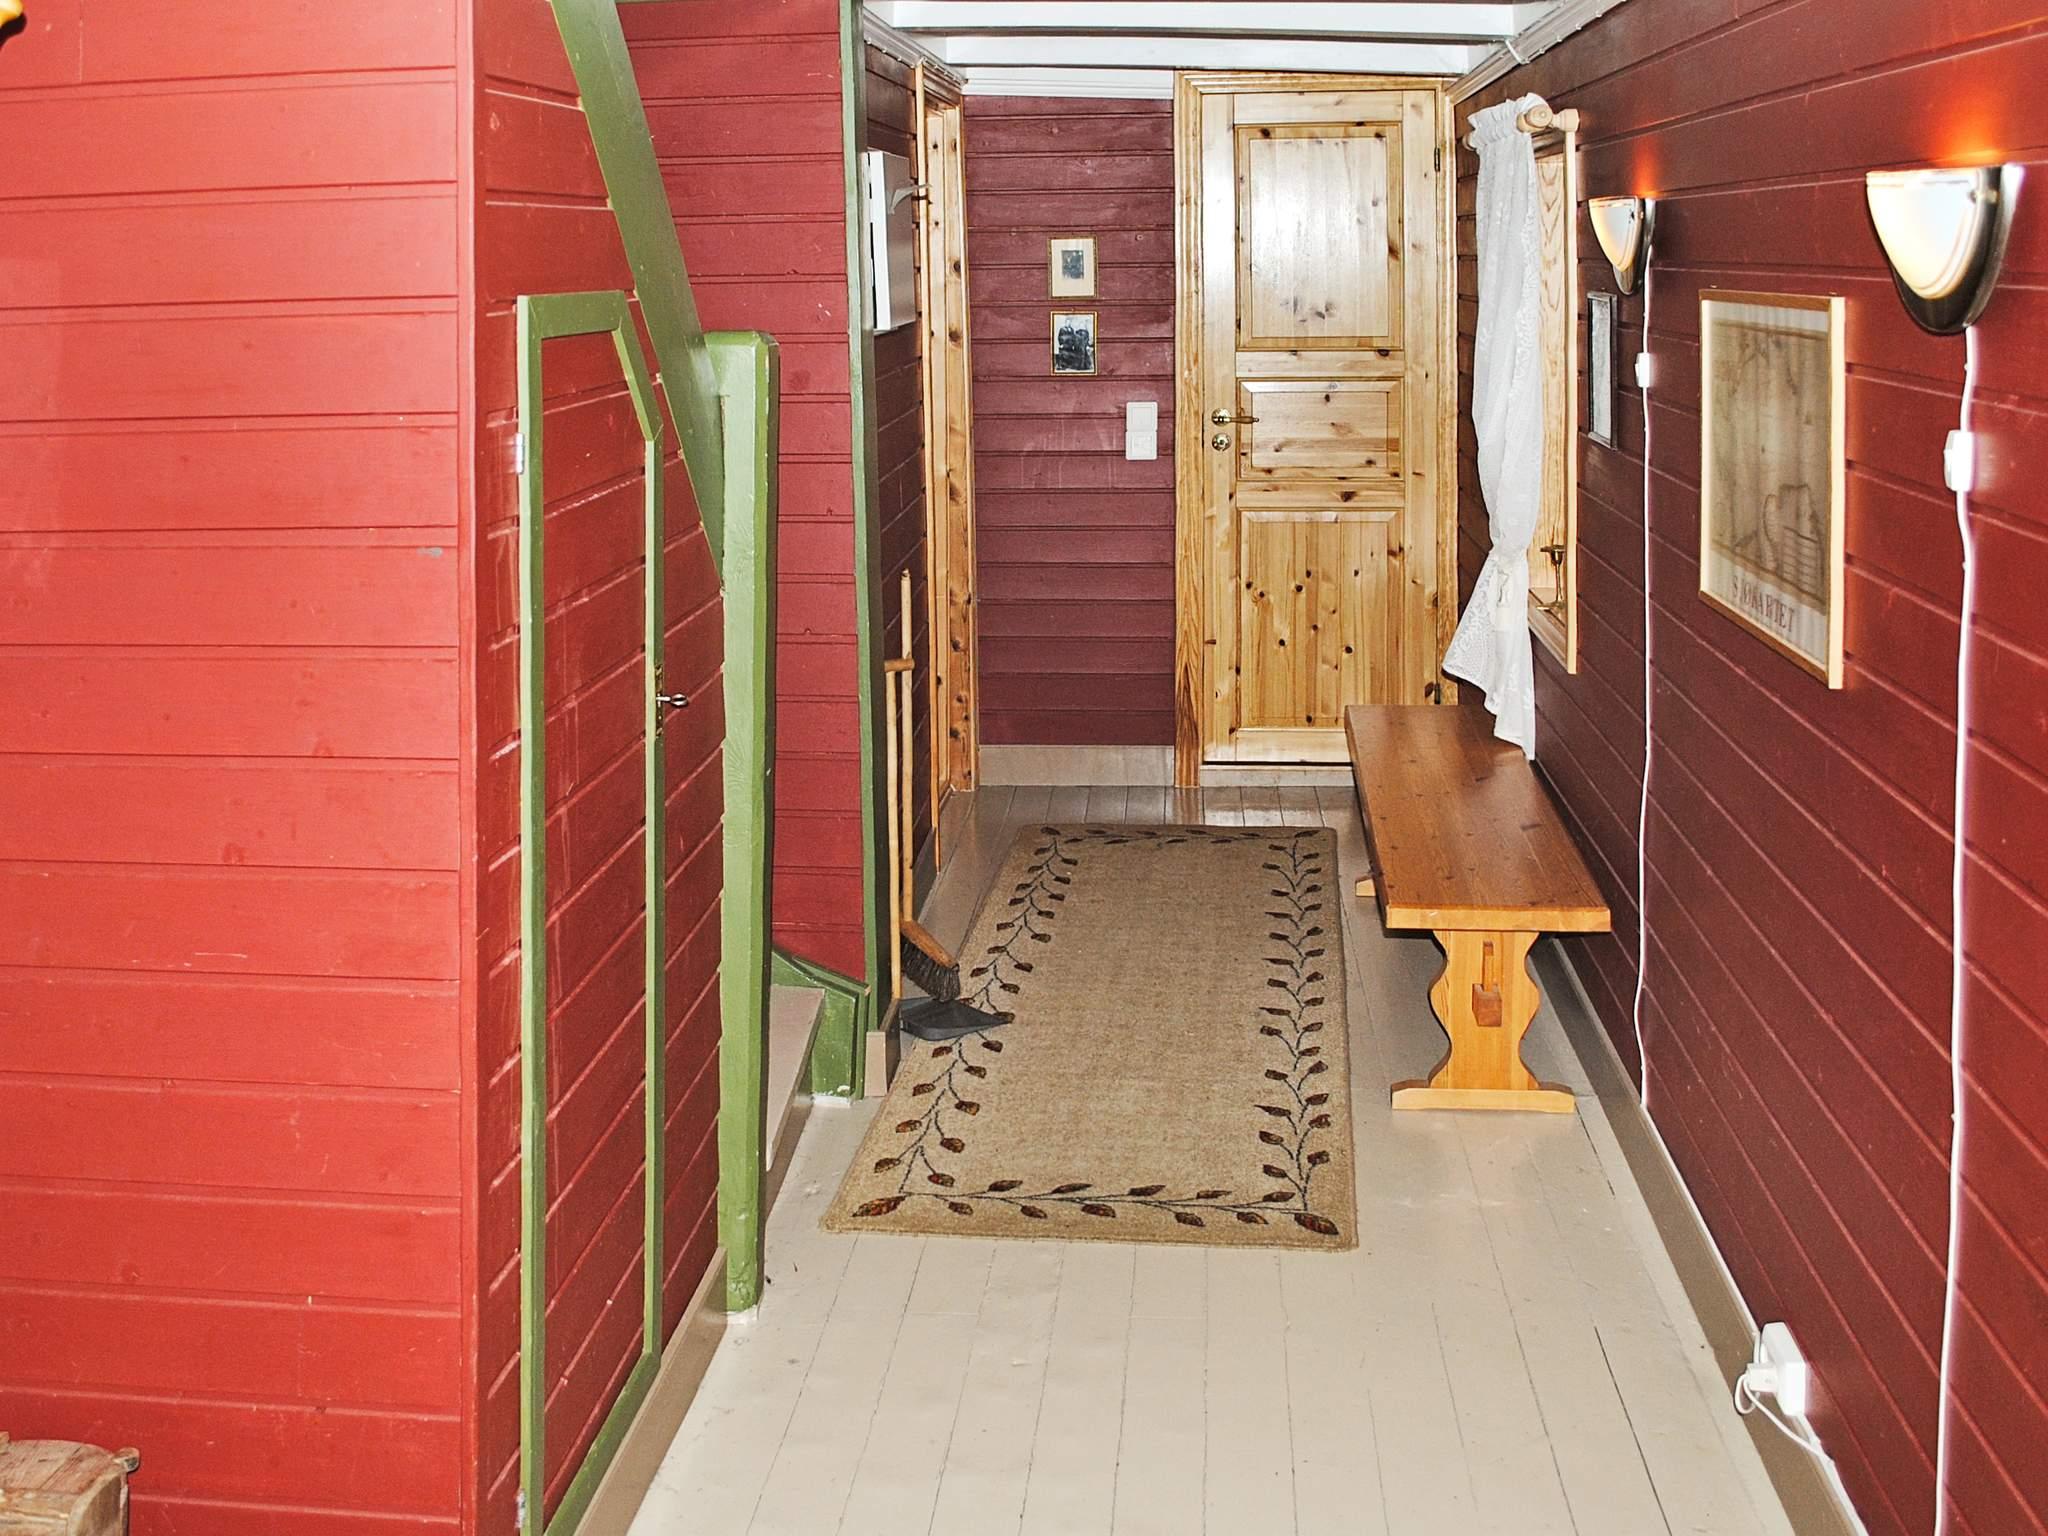 Ferienhaus Etne (83639), Etne, Hordaland - Hardangerfjord, Westnorwegen, Norwegen, Bild 8